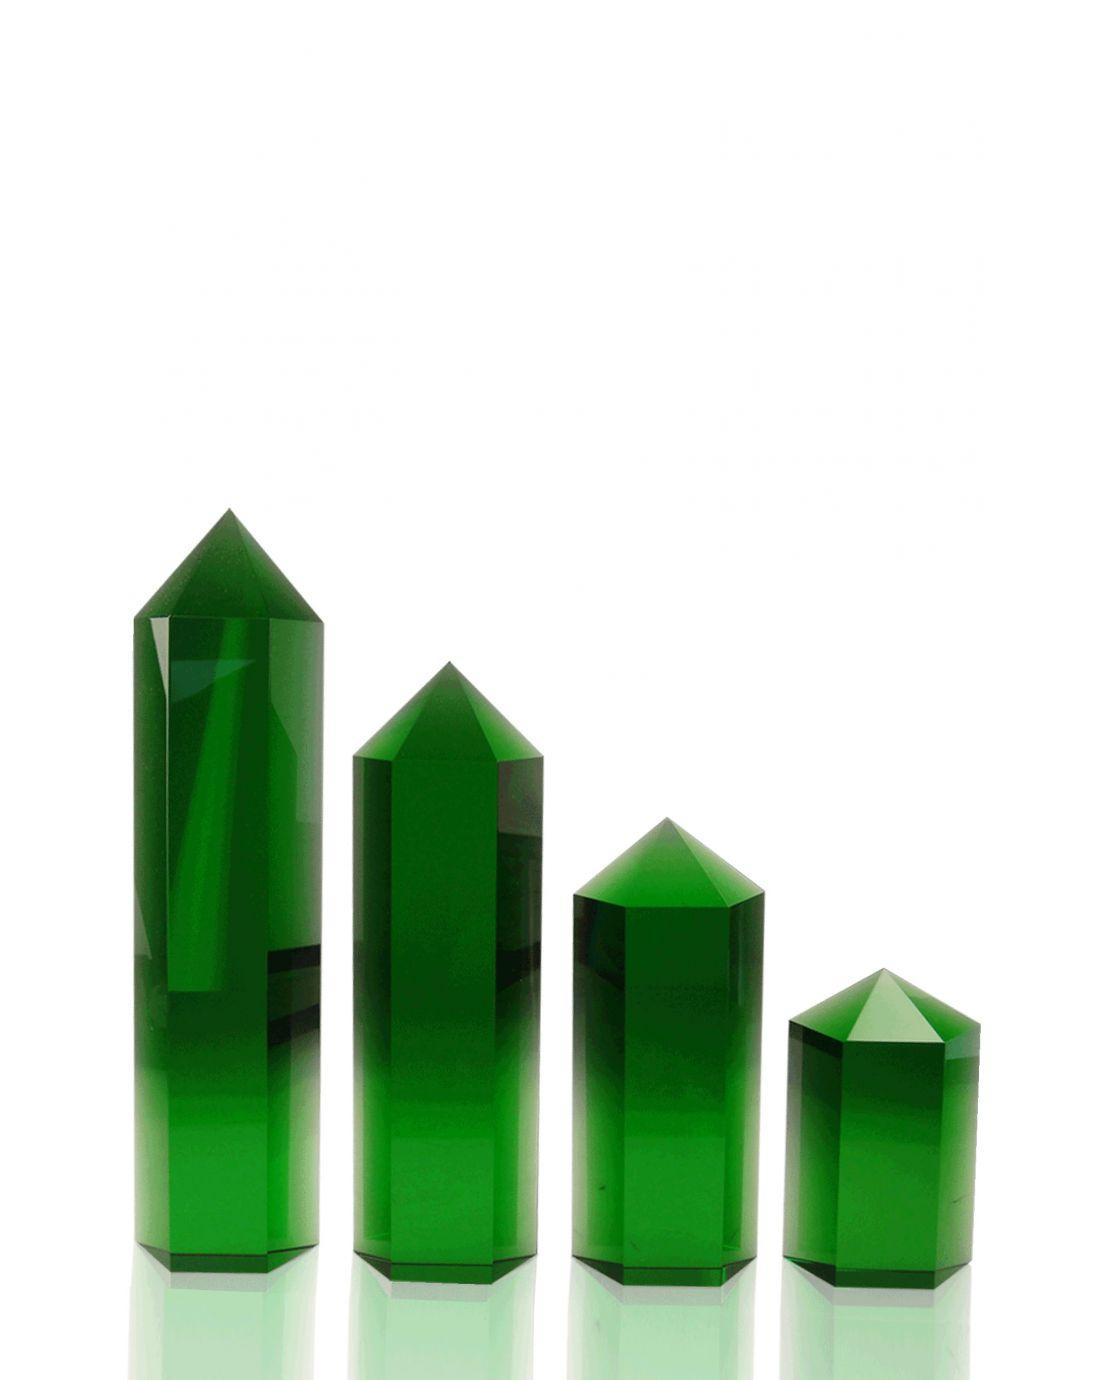 Hexagon Columns Green